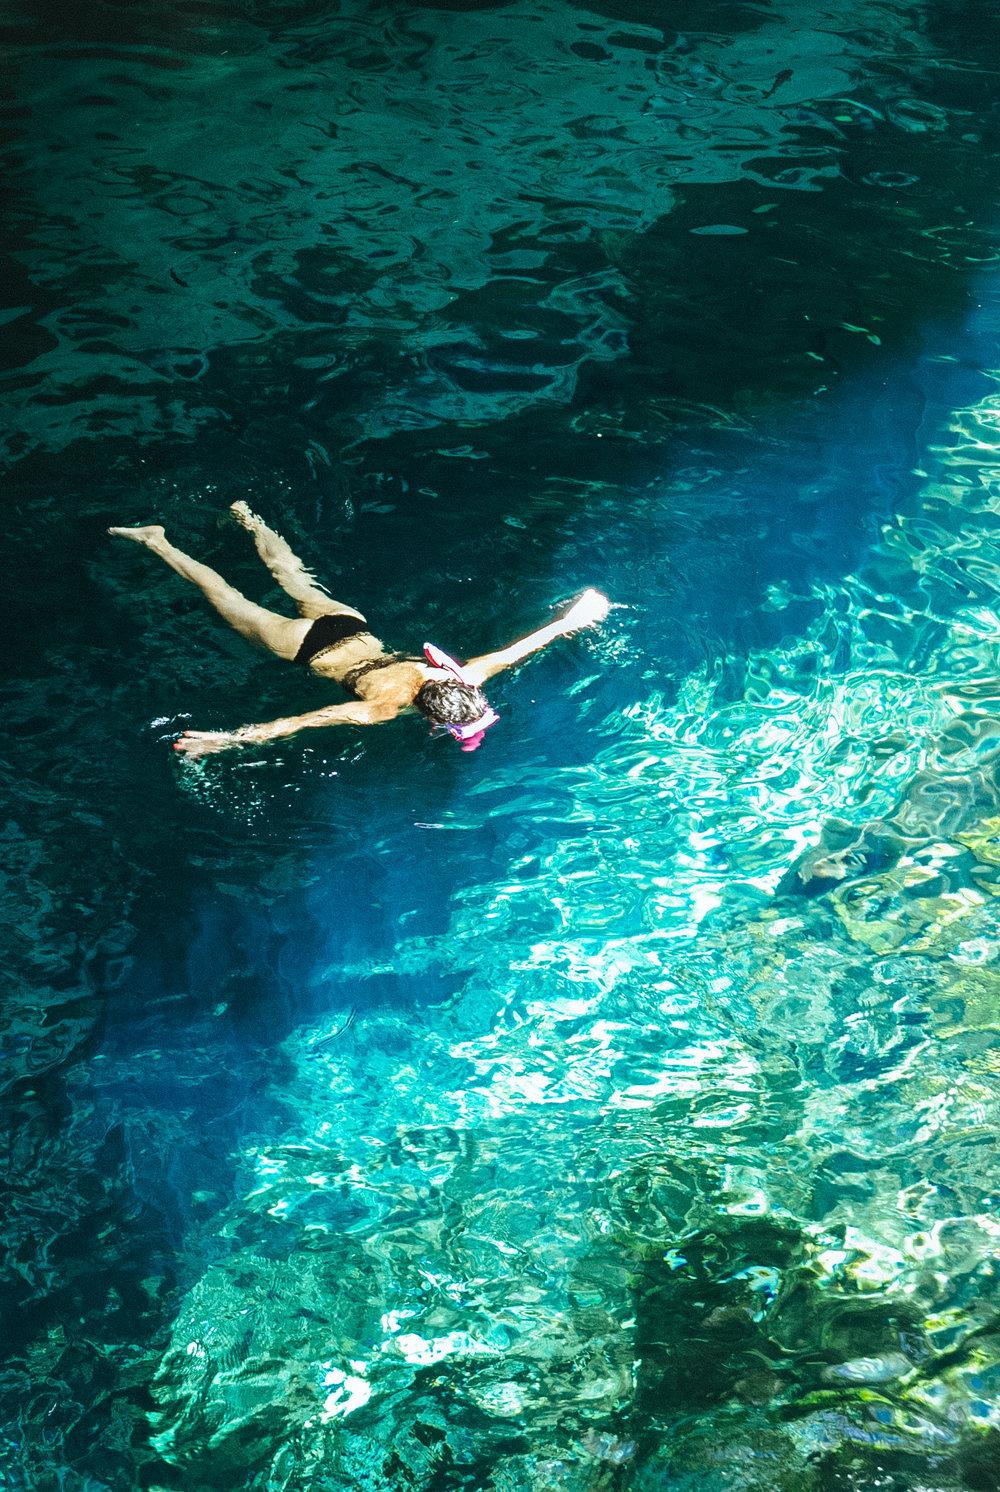 Tulum, Cenote, Eufemia Tg - México Tropical® travel agency-37.jpg